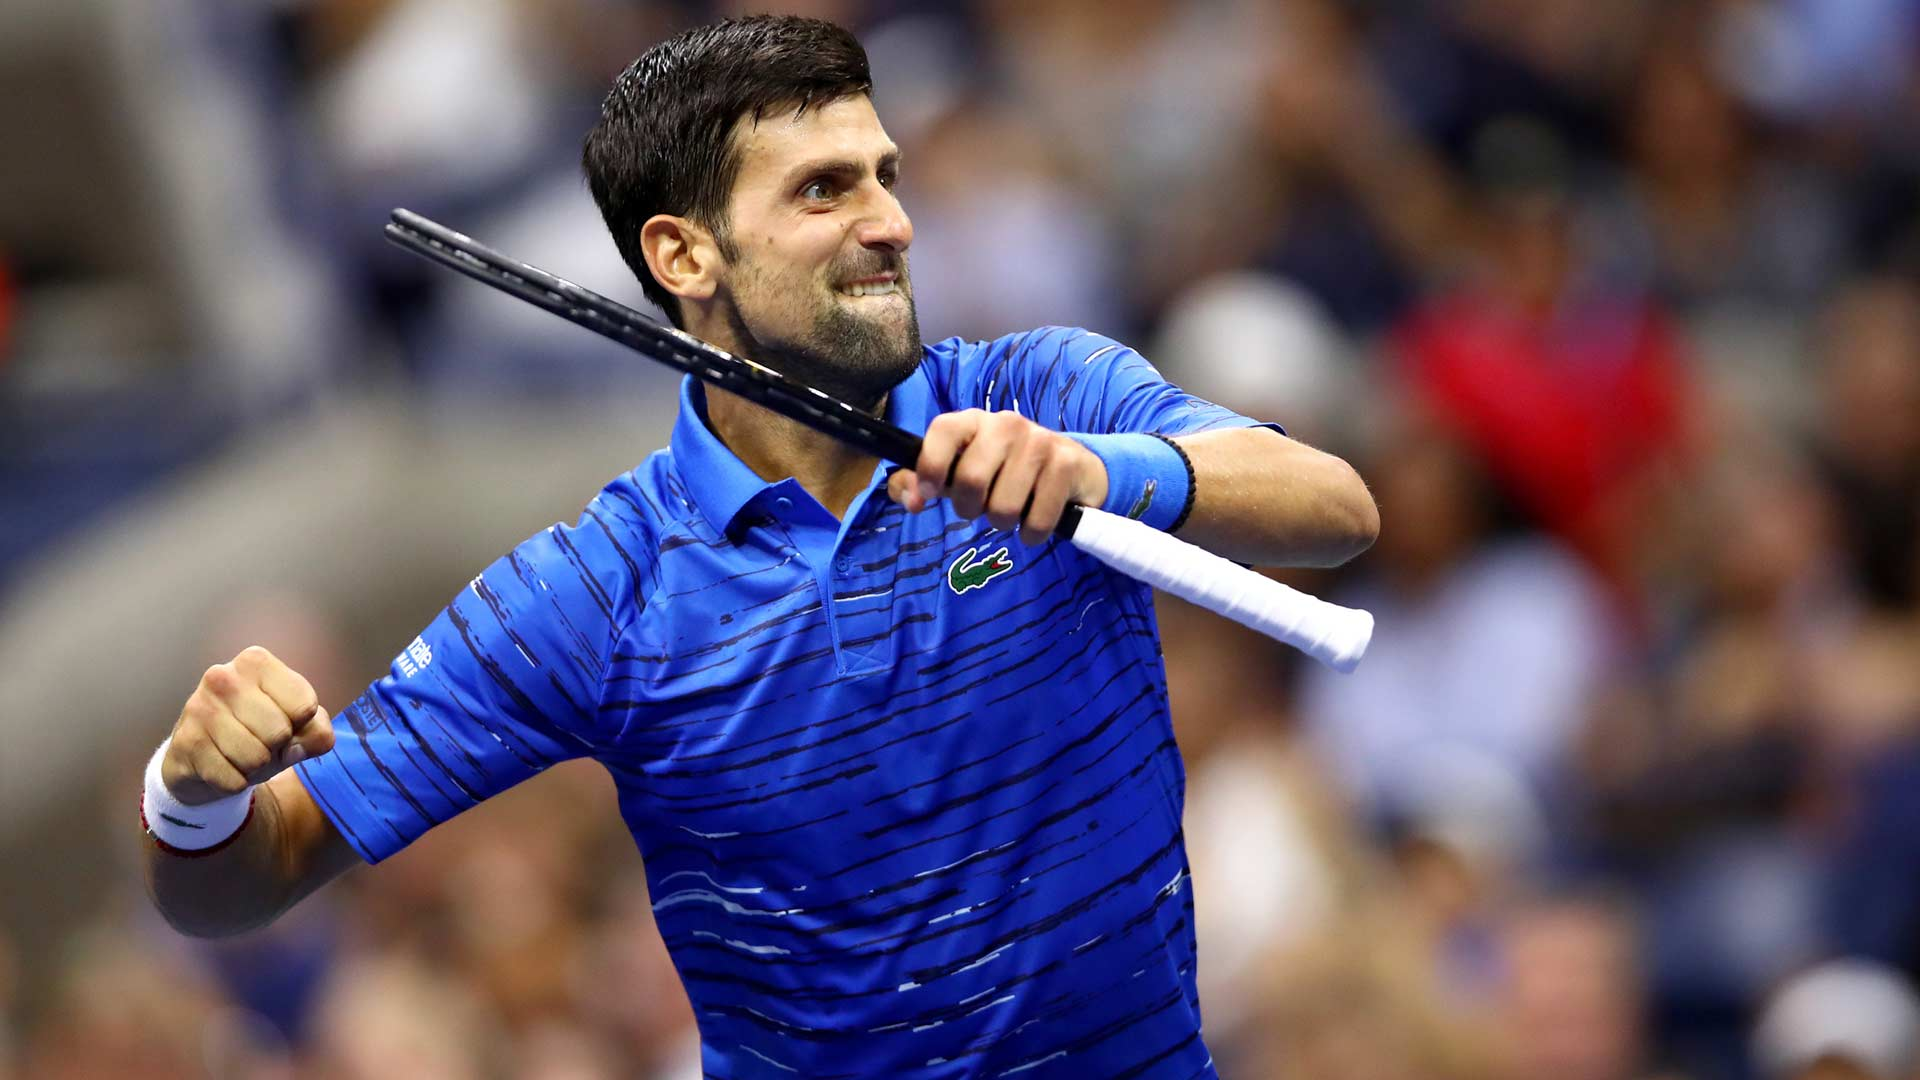 Novak Djokovic, Denis Kudla, Sports, Tennis, US Open, NewsMobile, Mobile, News, India